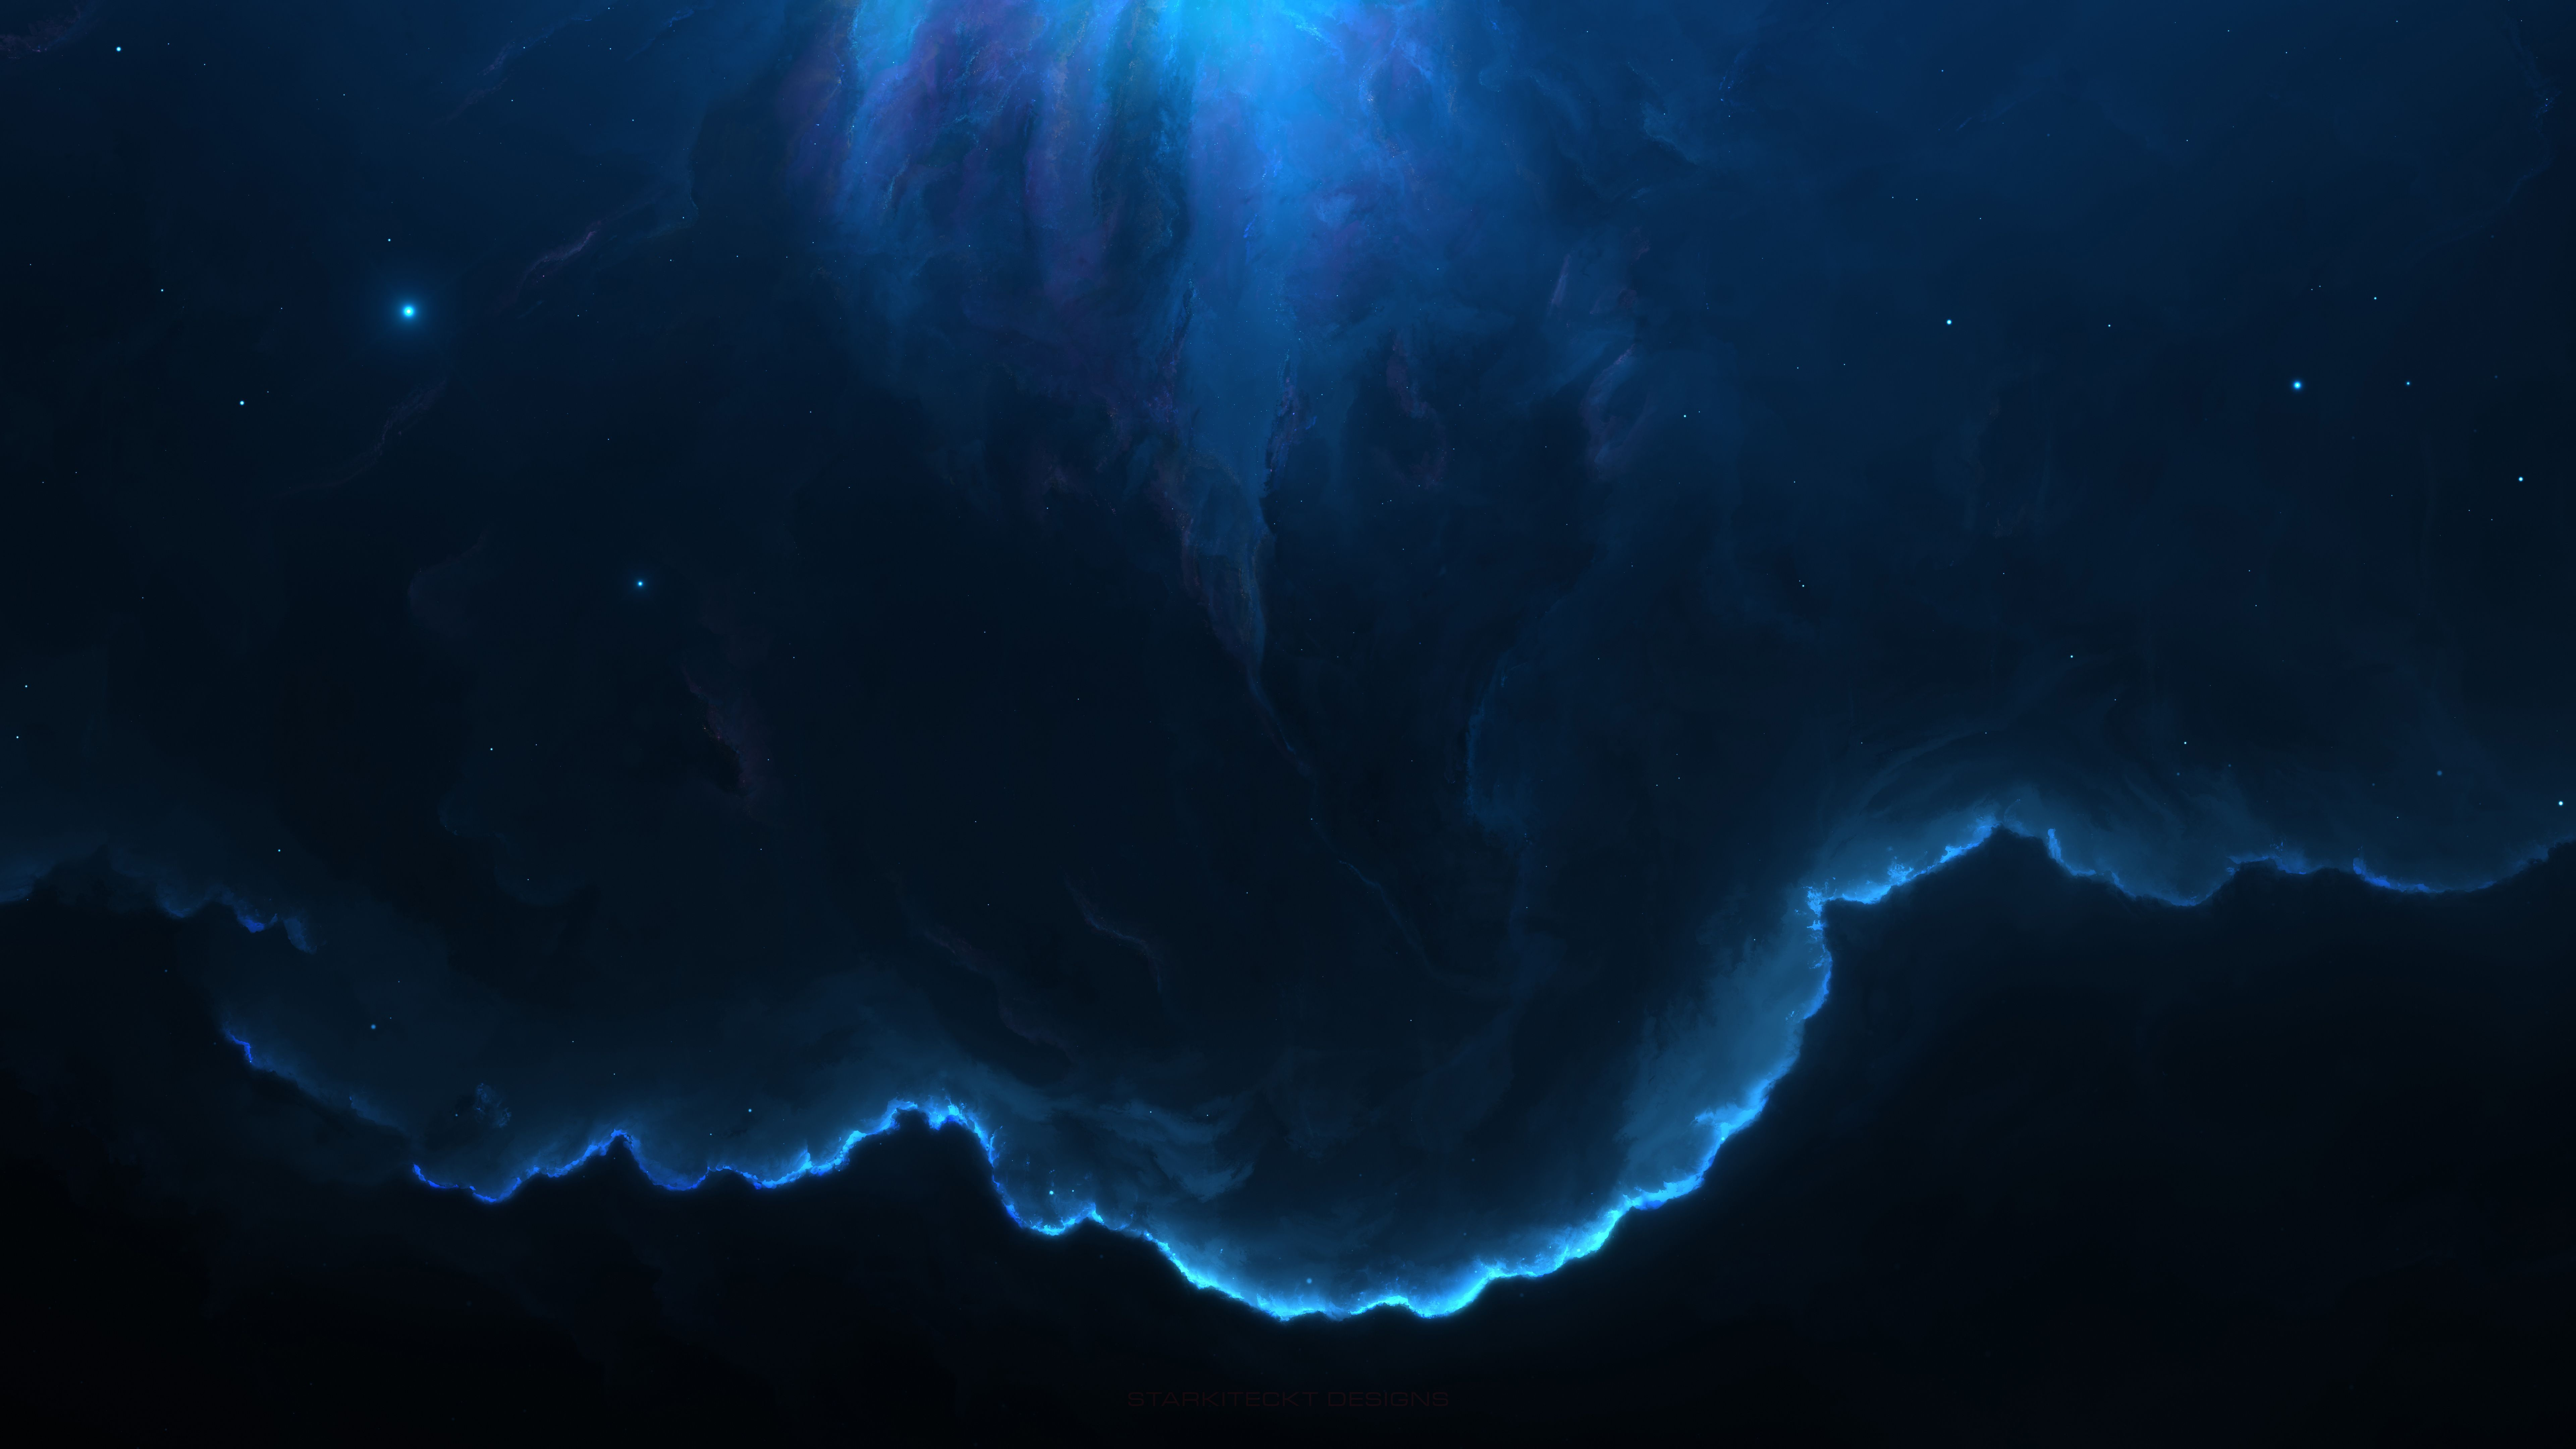 7680x4320 7680x4320 Nebula Space Blue 12k 8k Hd 4k Wallpapers Images Tapete